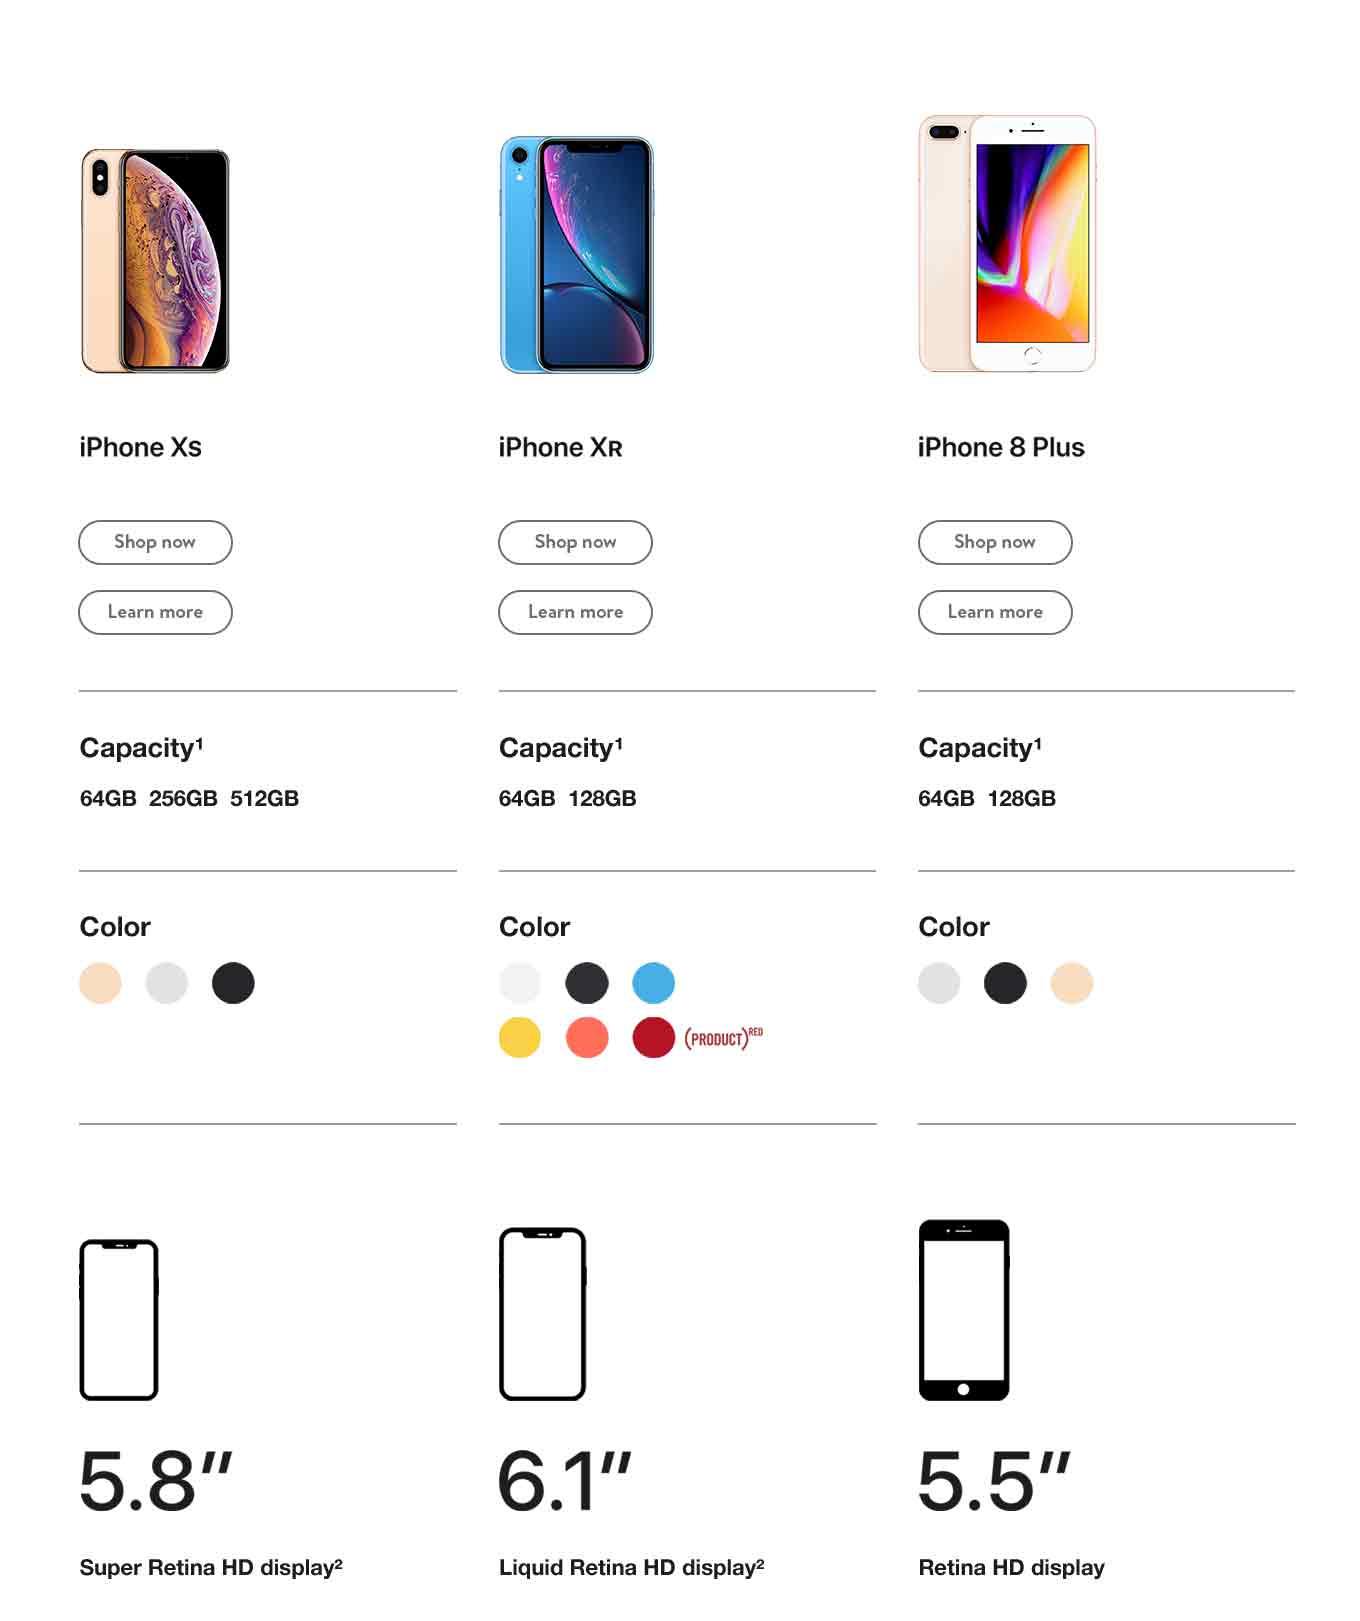 iPhone XS, iPhone XR, iPhone 8 Plus